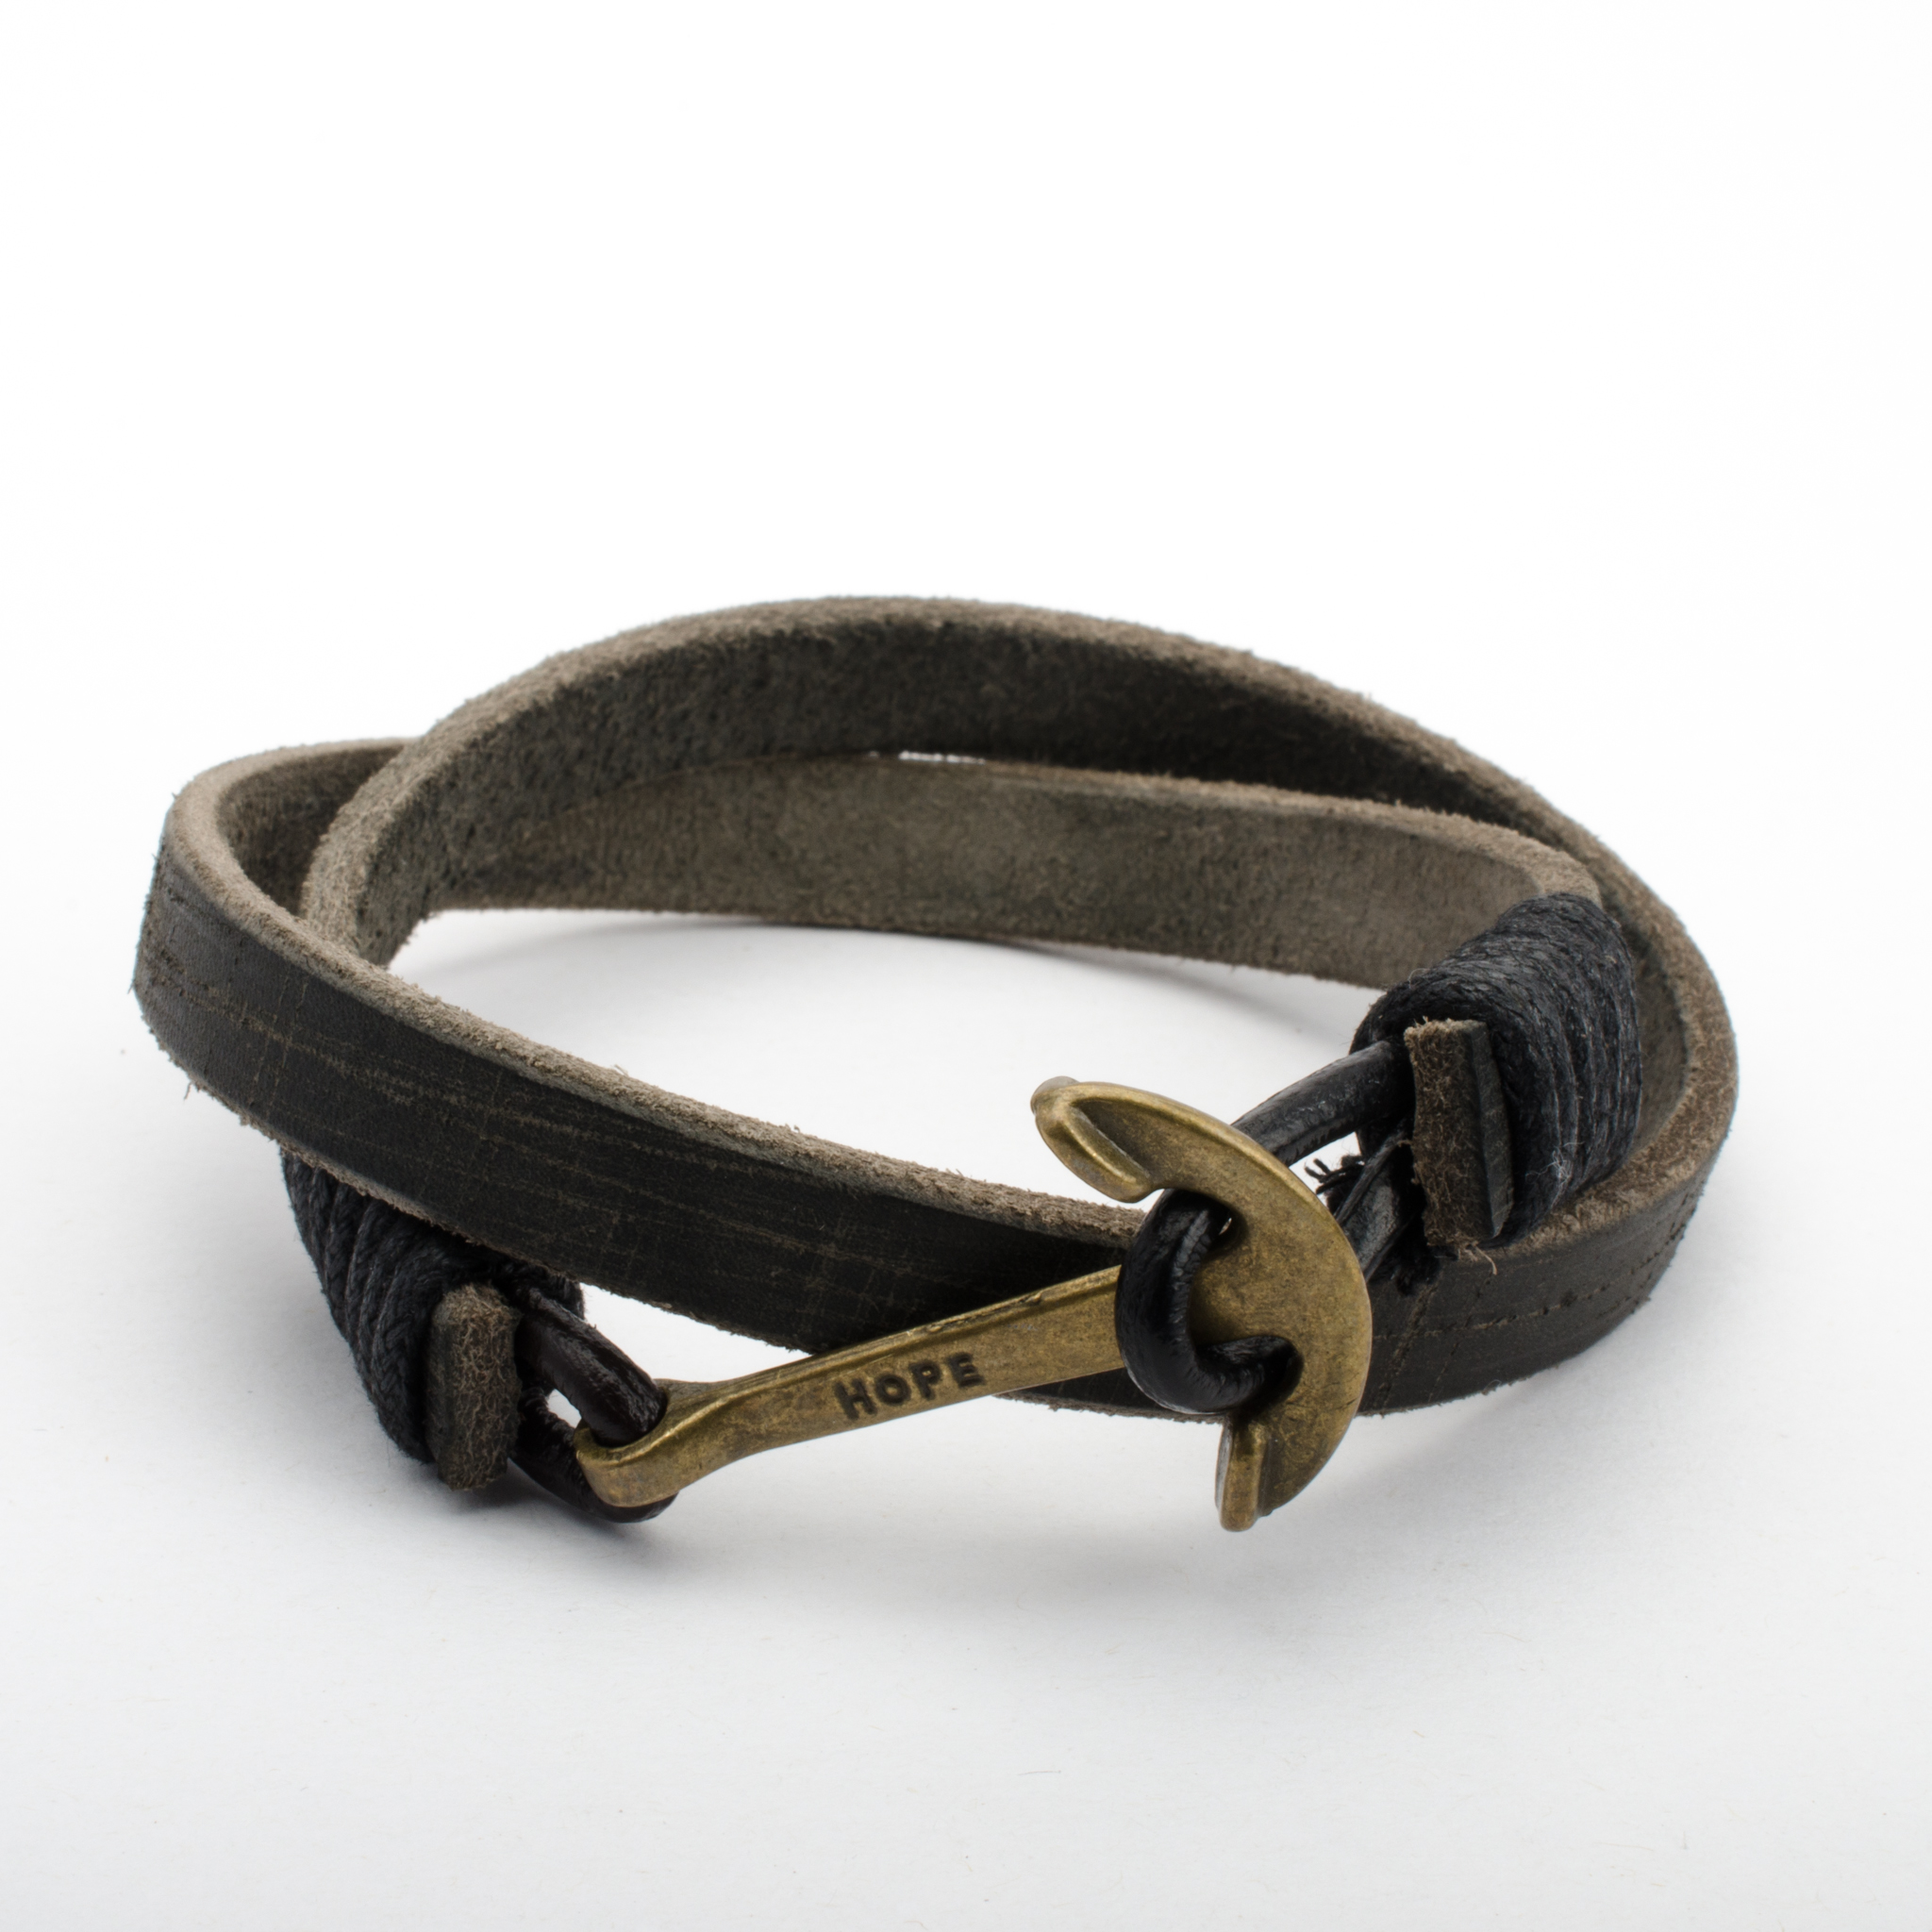 Bracelet Leather Hope Anchor Brass Hook